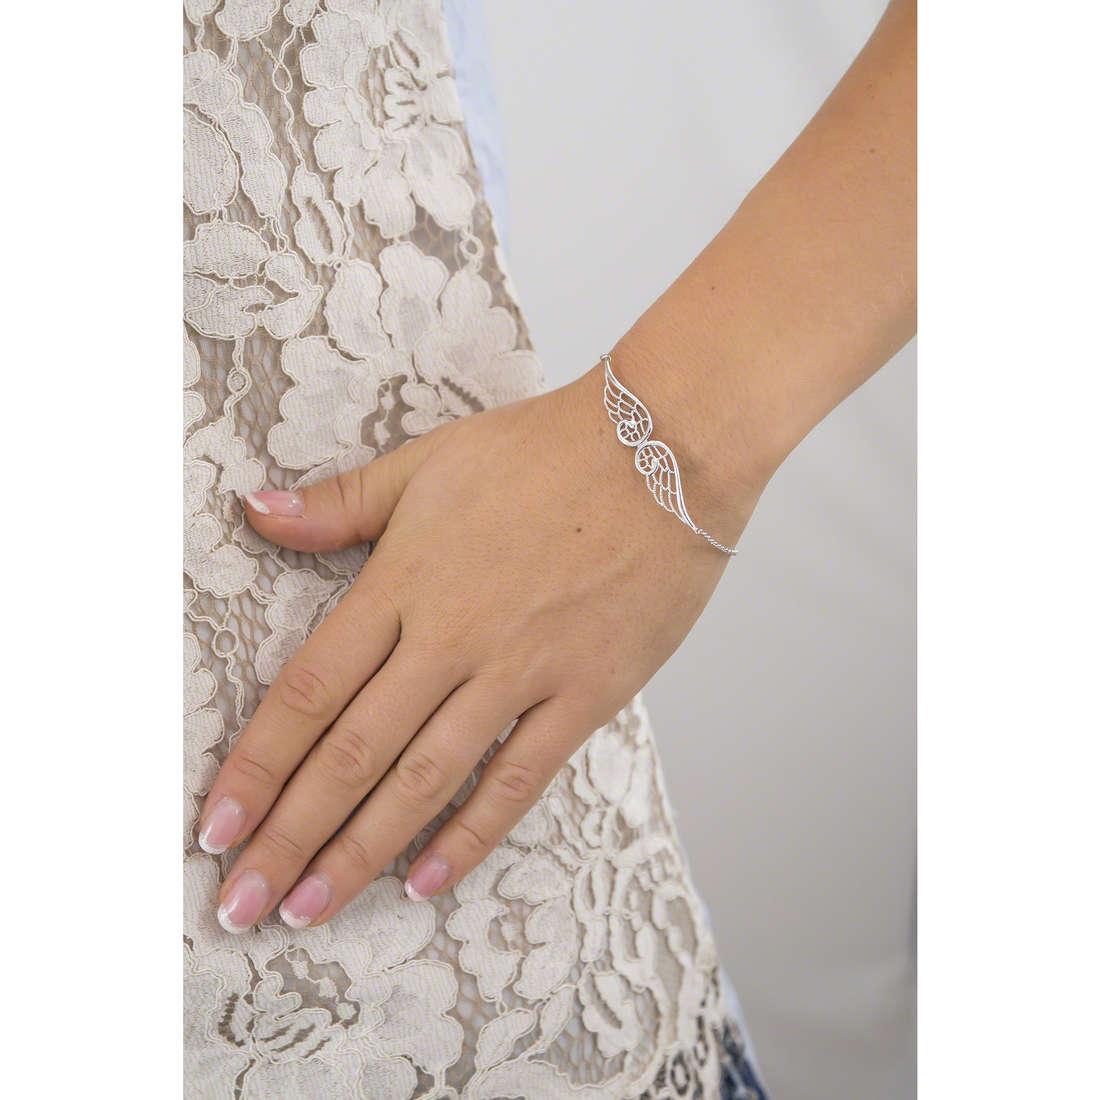 Nomination bracciali Angel donna 145301/010 indosso